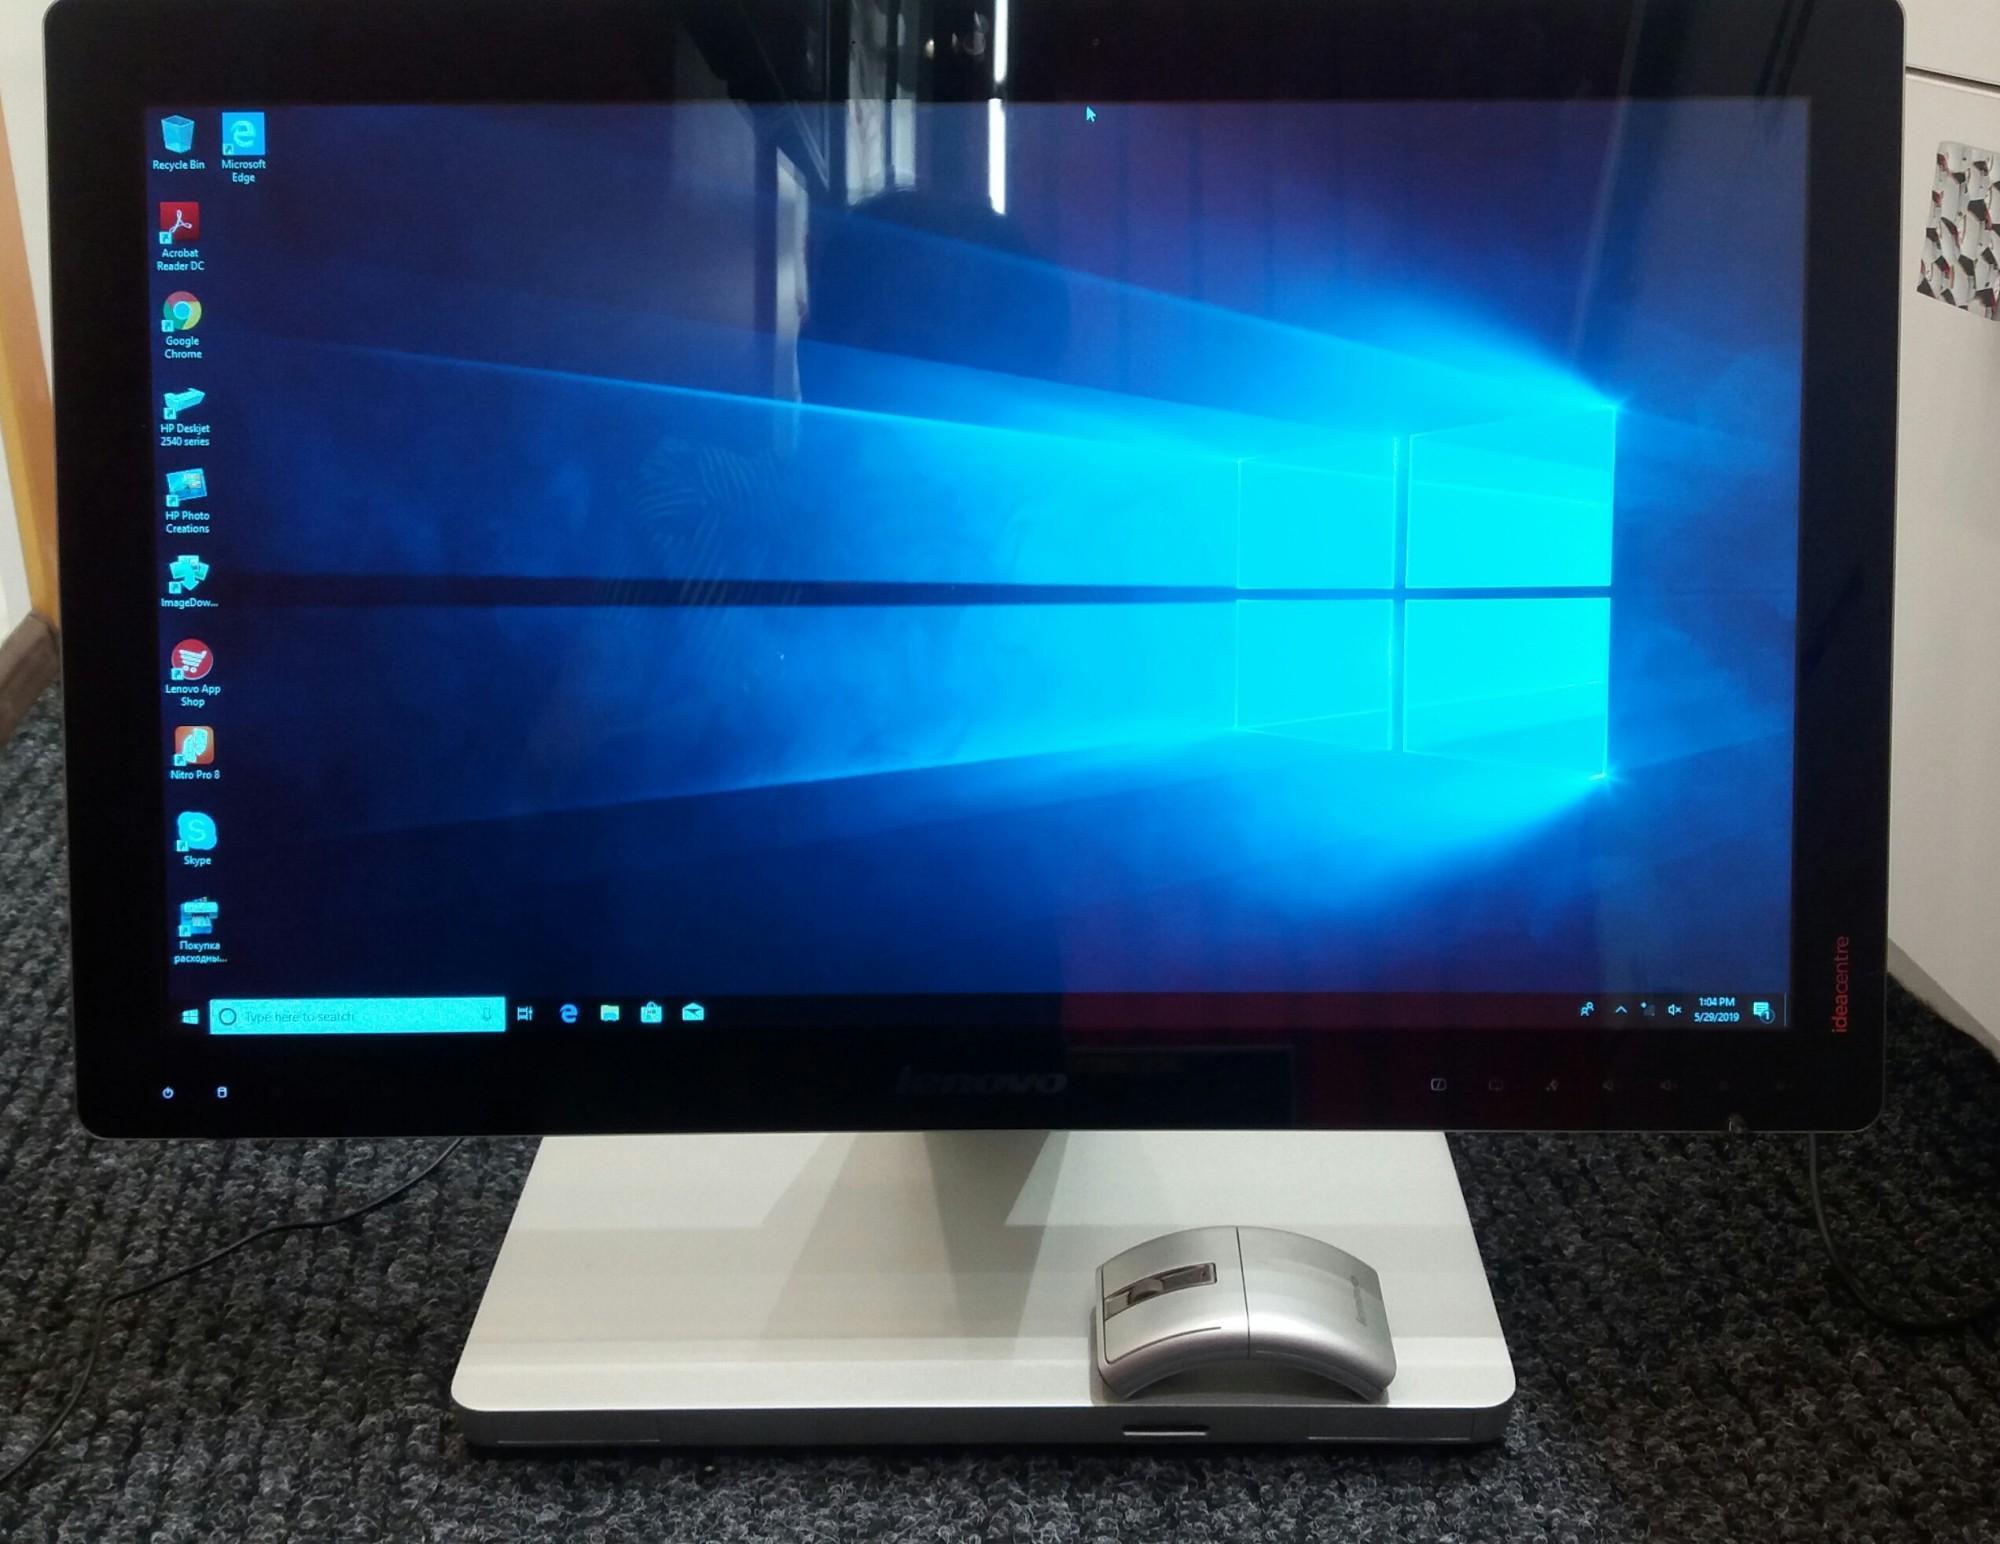 2e33cb40d7f Lauaarvuti Lenovo ideacentre All in one - Luutar